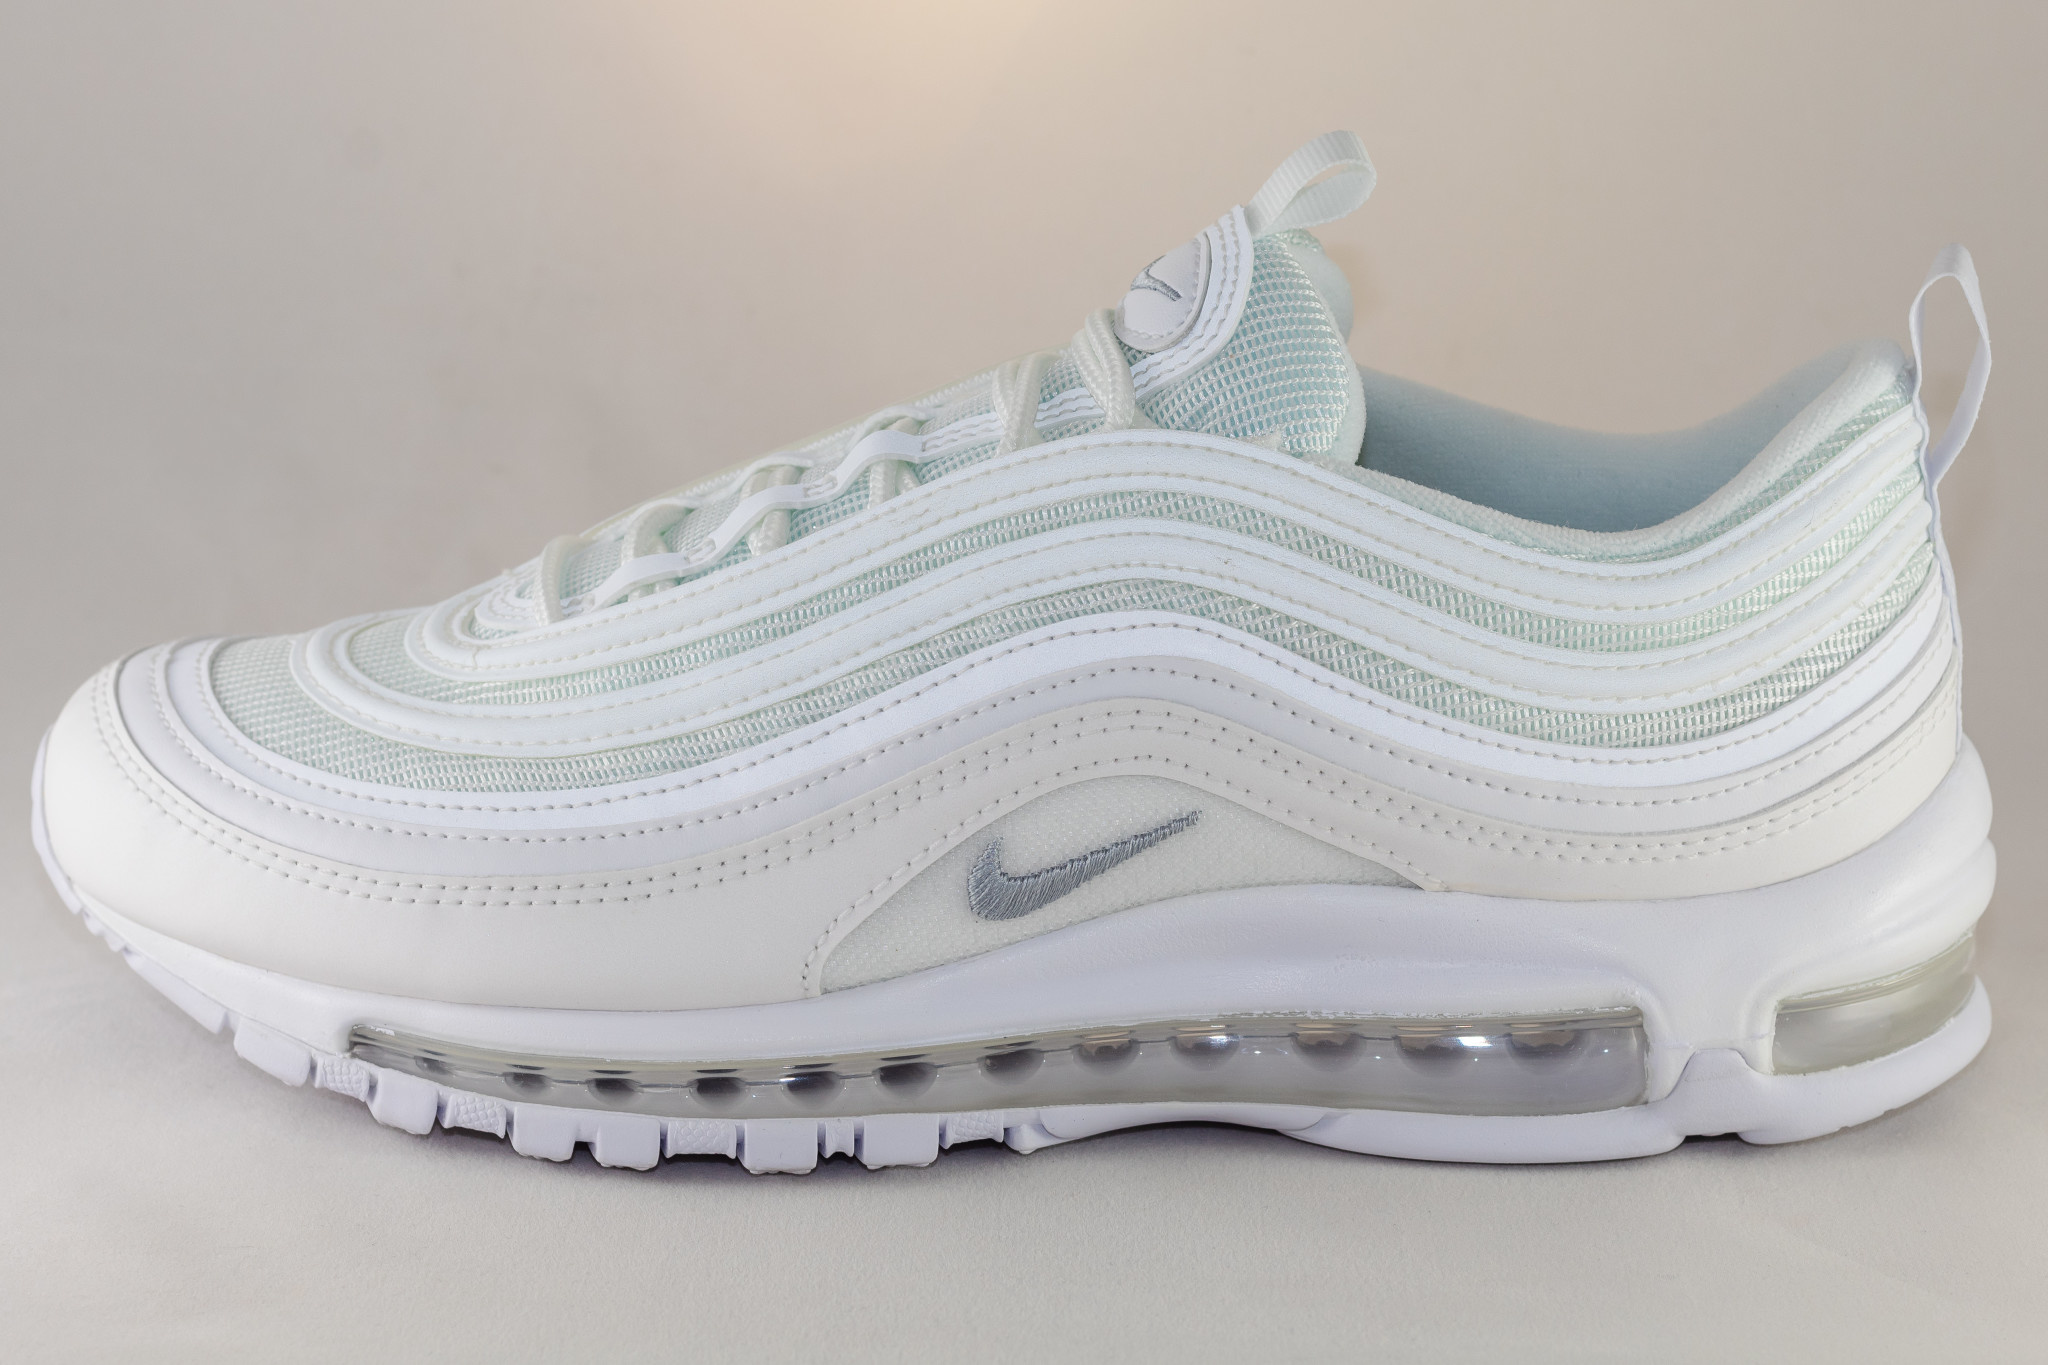 Nike AIR MAX 97 White/ Wolf Grey-Black